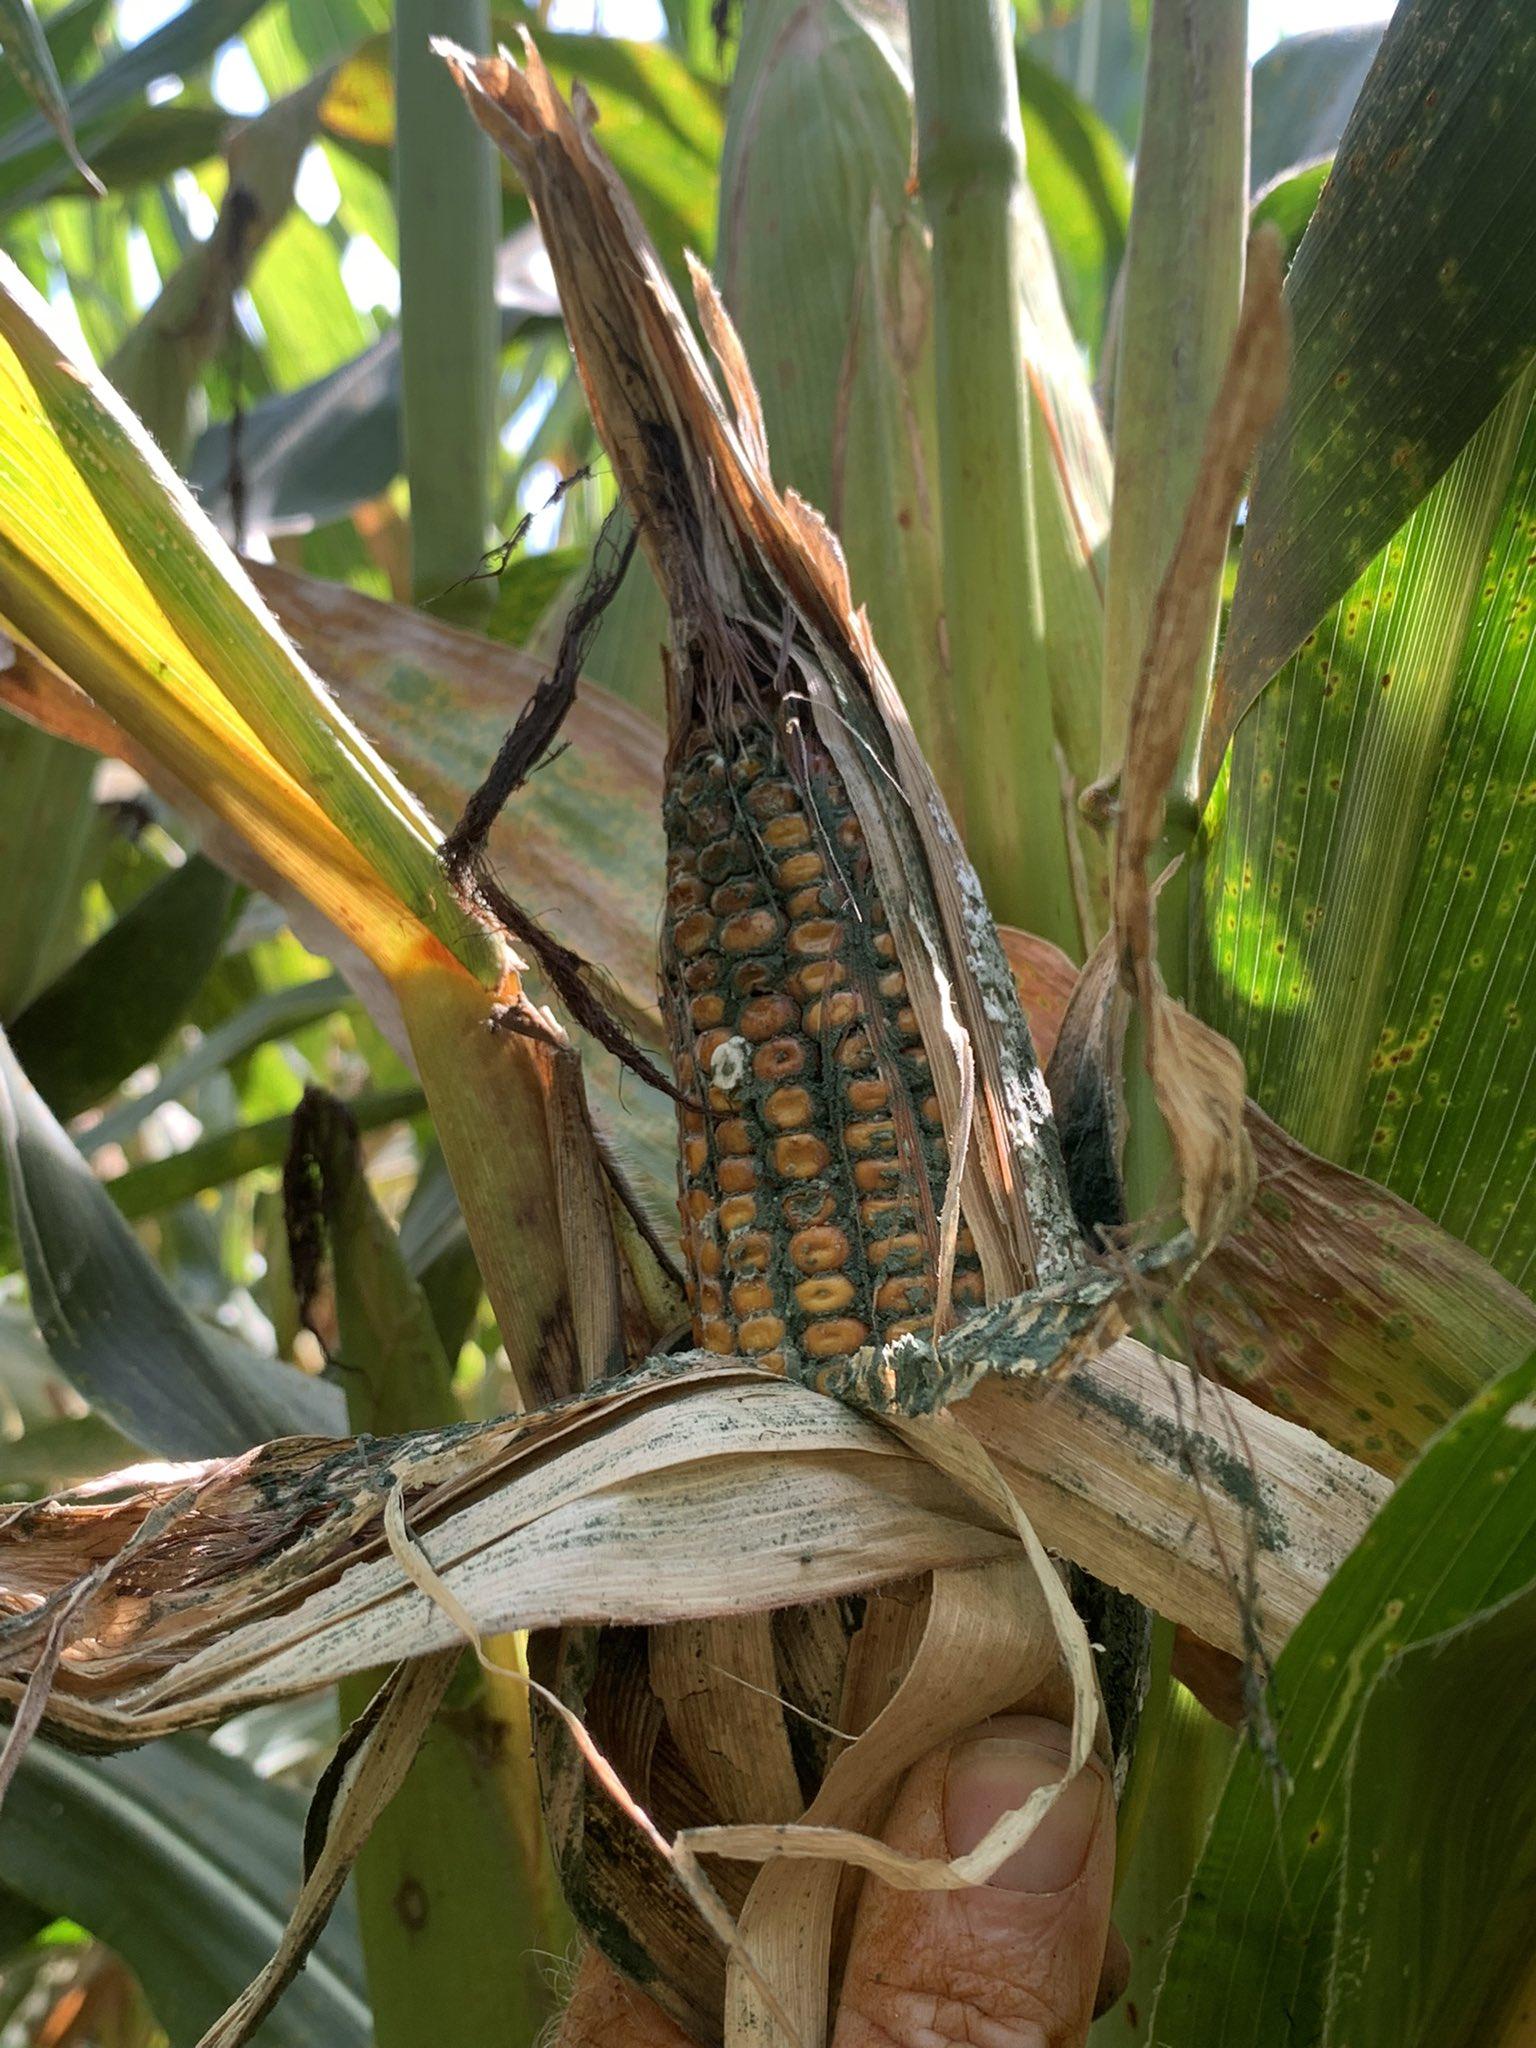 Trichoderma ear rot fungal growth on kernels.